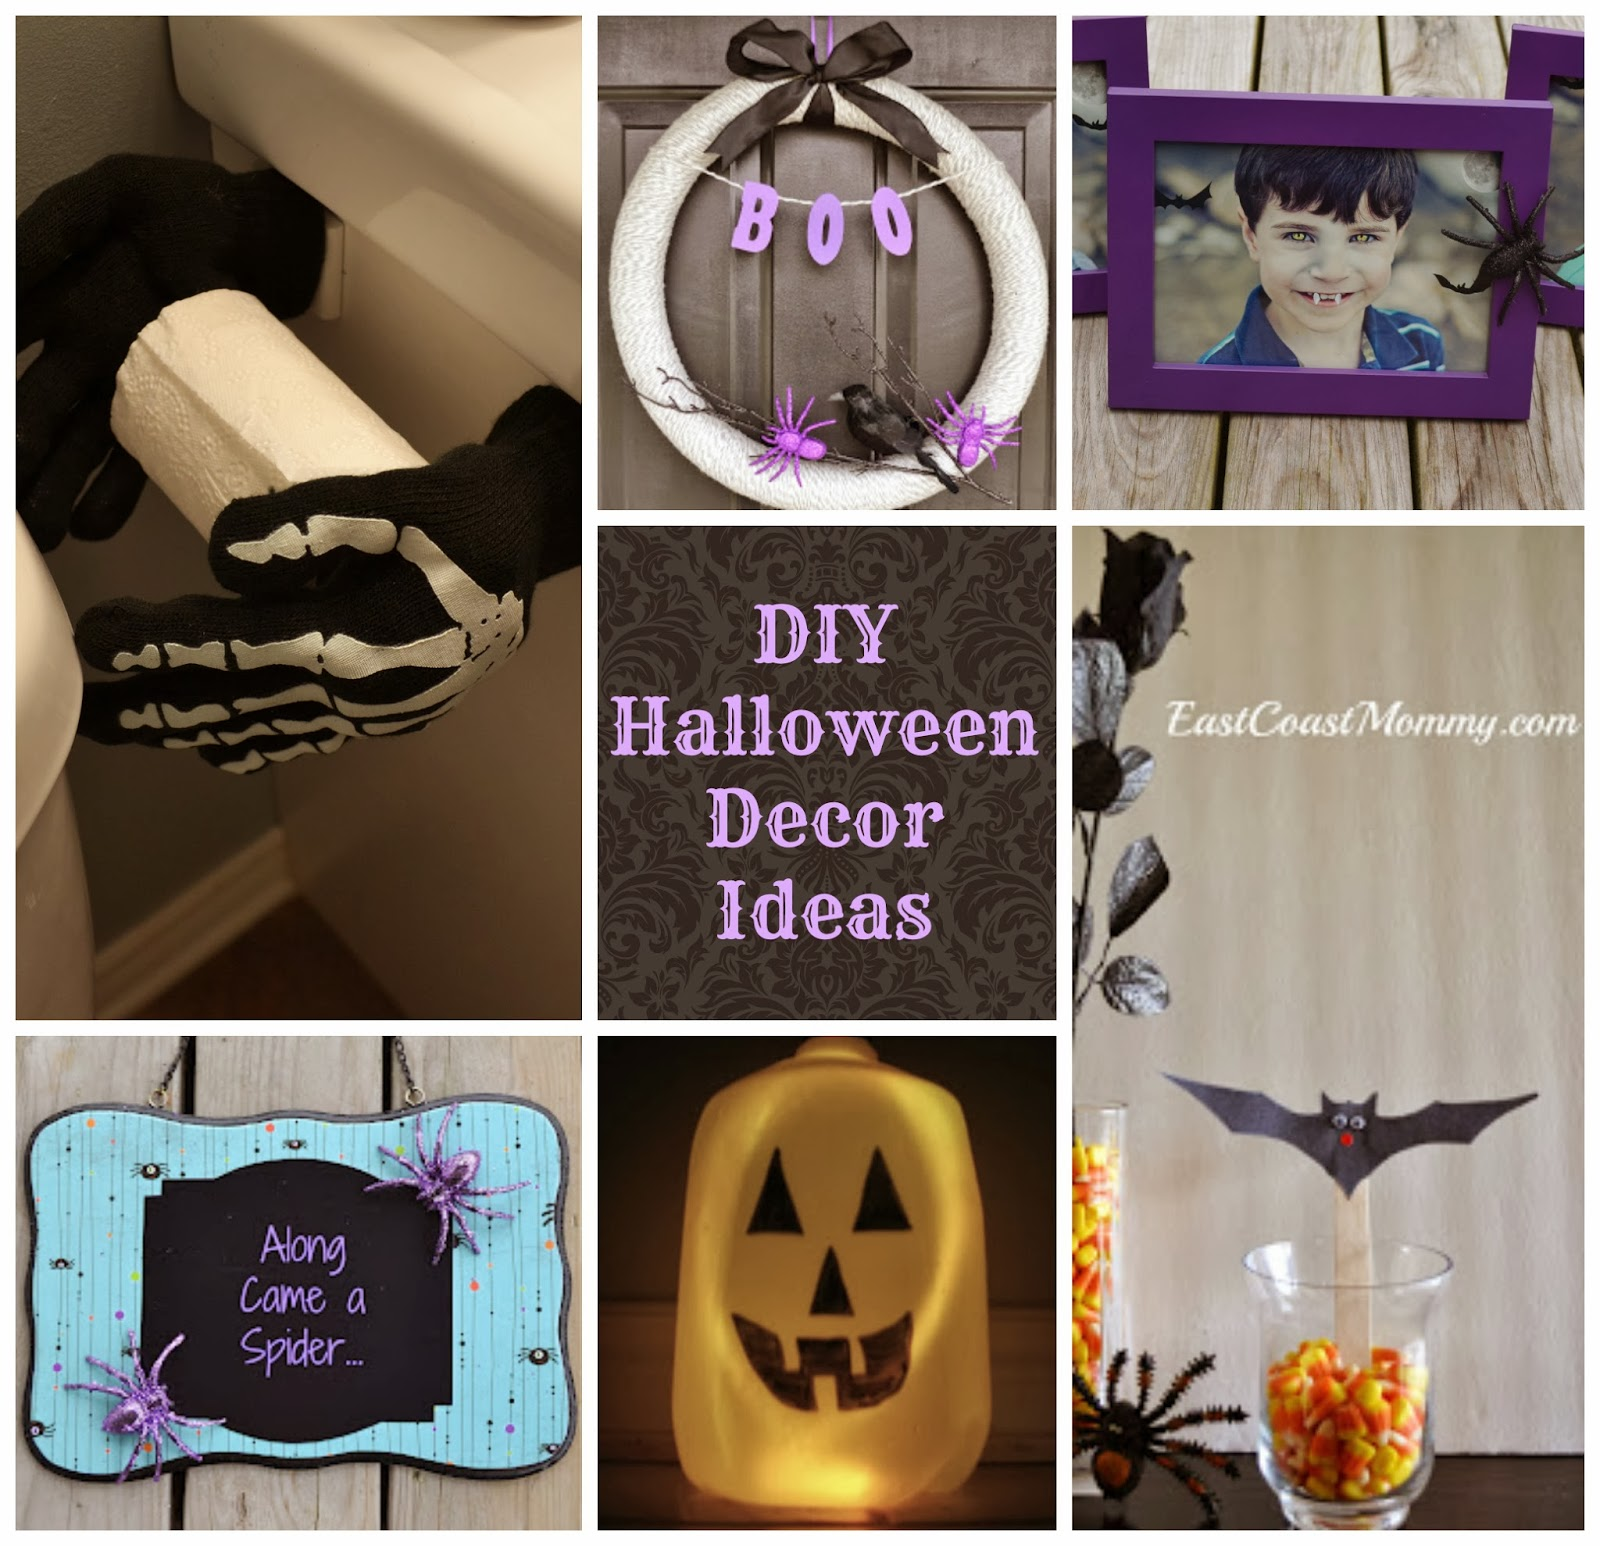 East Coast Mommy 7 Fantastic DIY Halloween Decor Ideas